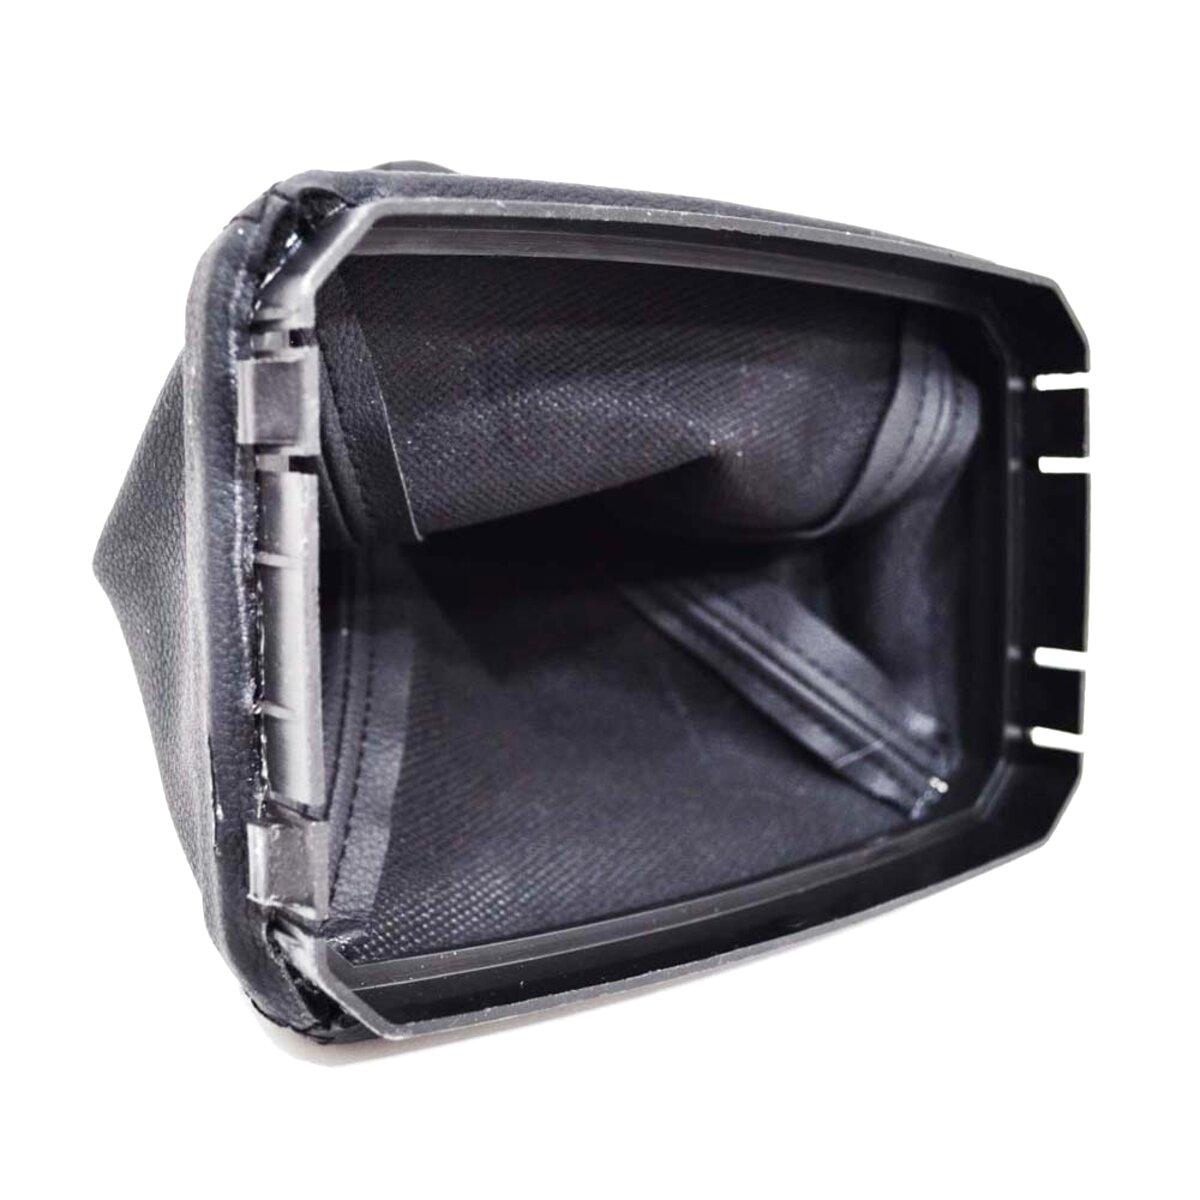 Color Aerzetix Dark grey . Gear shift gaiter of faux leather